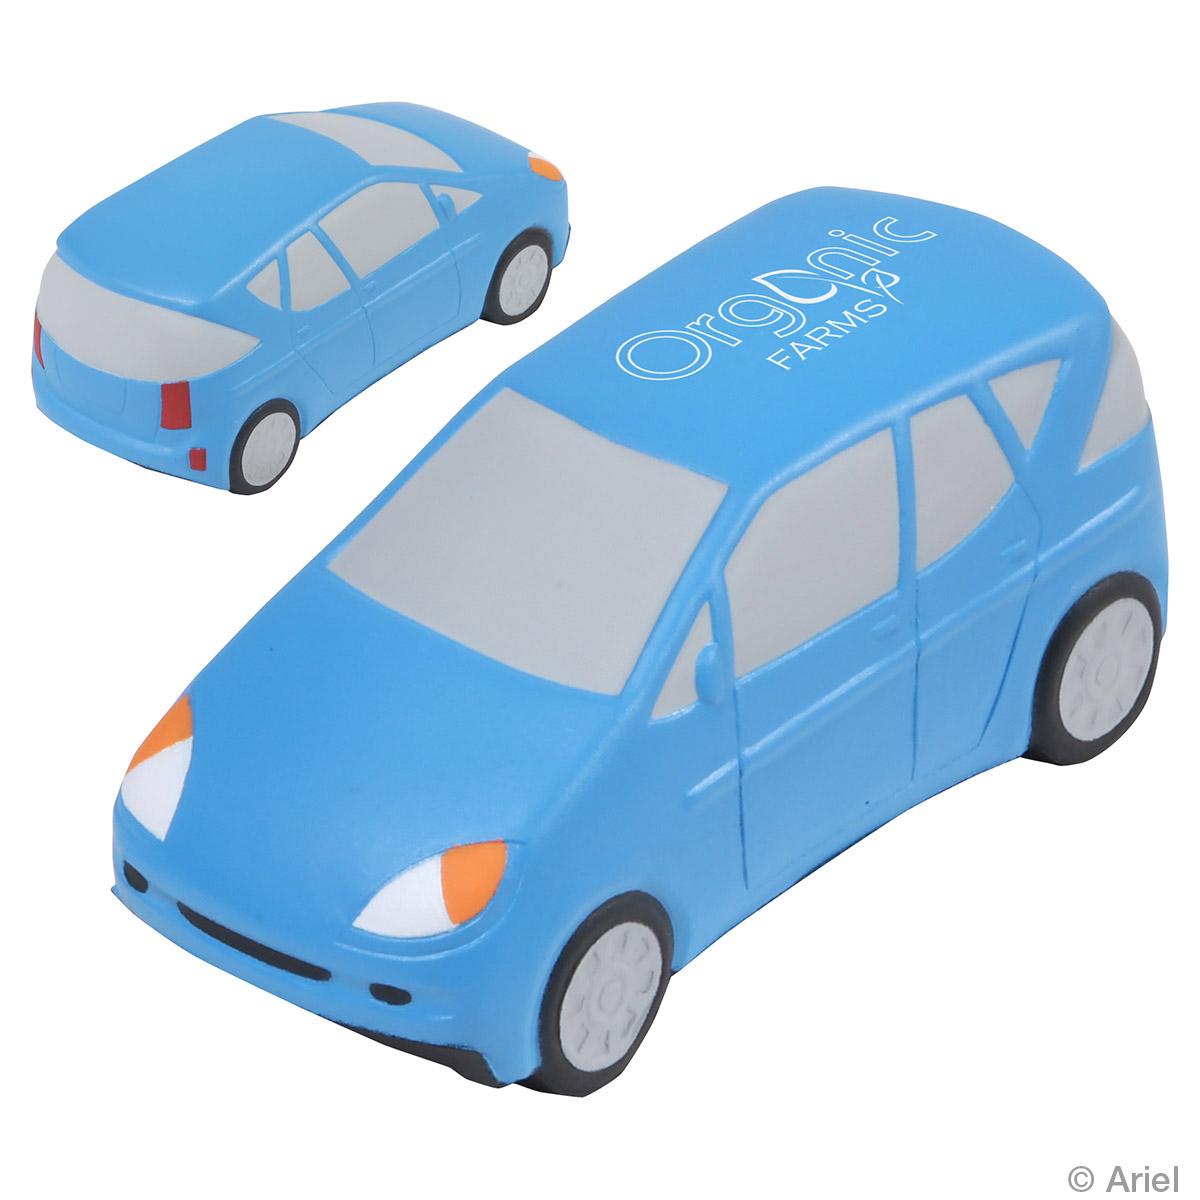 Hybrid Car Stress Reliever, LTR-HC12, 1 Colour Imprint